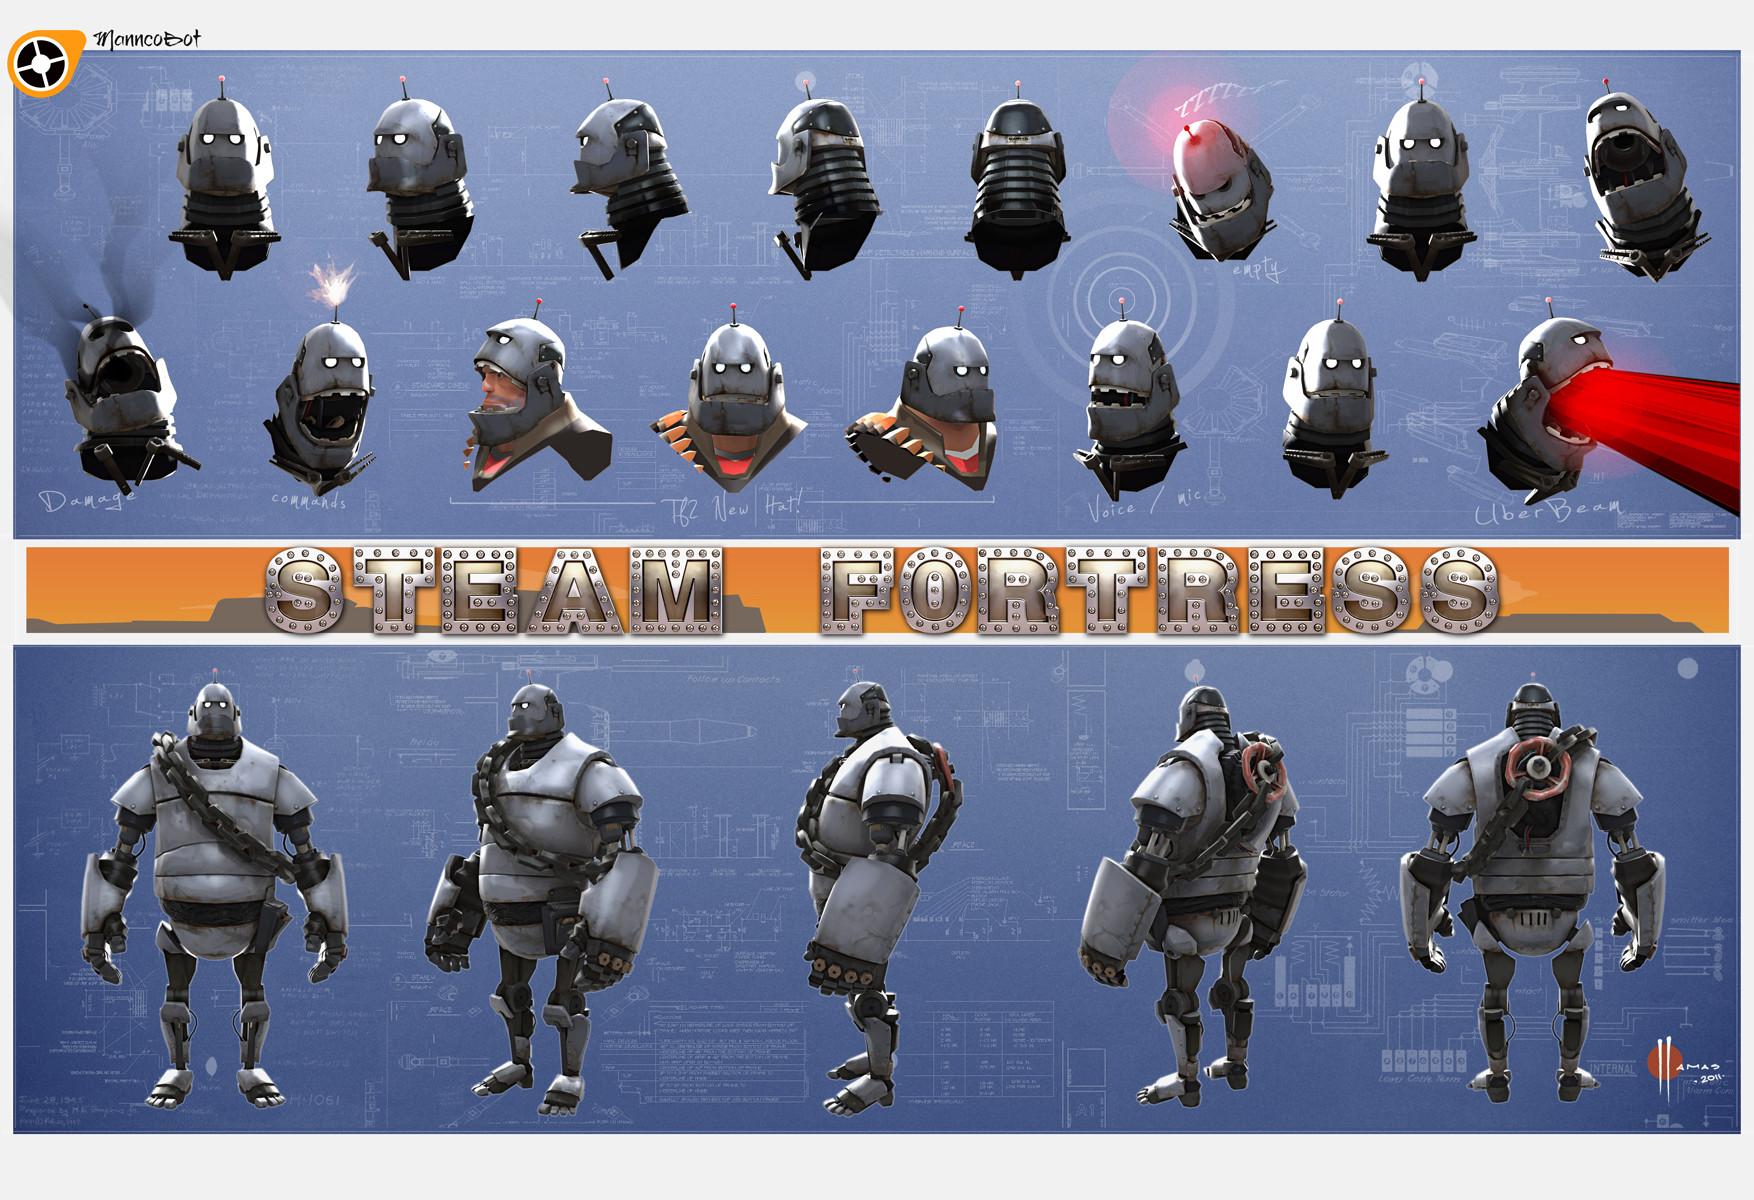 ArtStation - Team Fortress 2 - Heavy Bot [Character Sheet], Manny Llamas